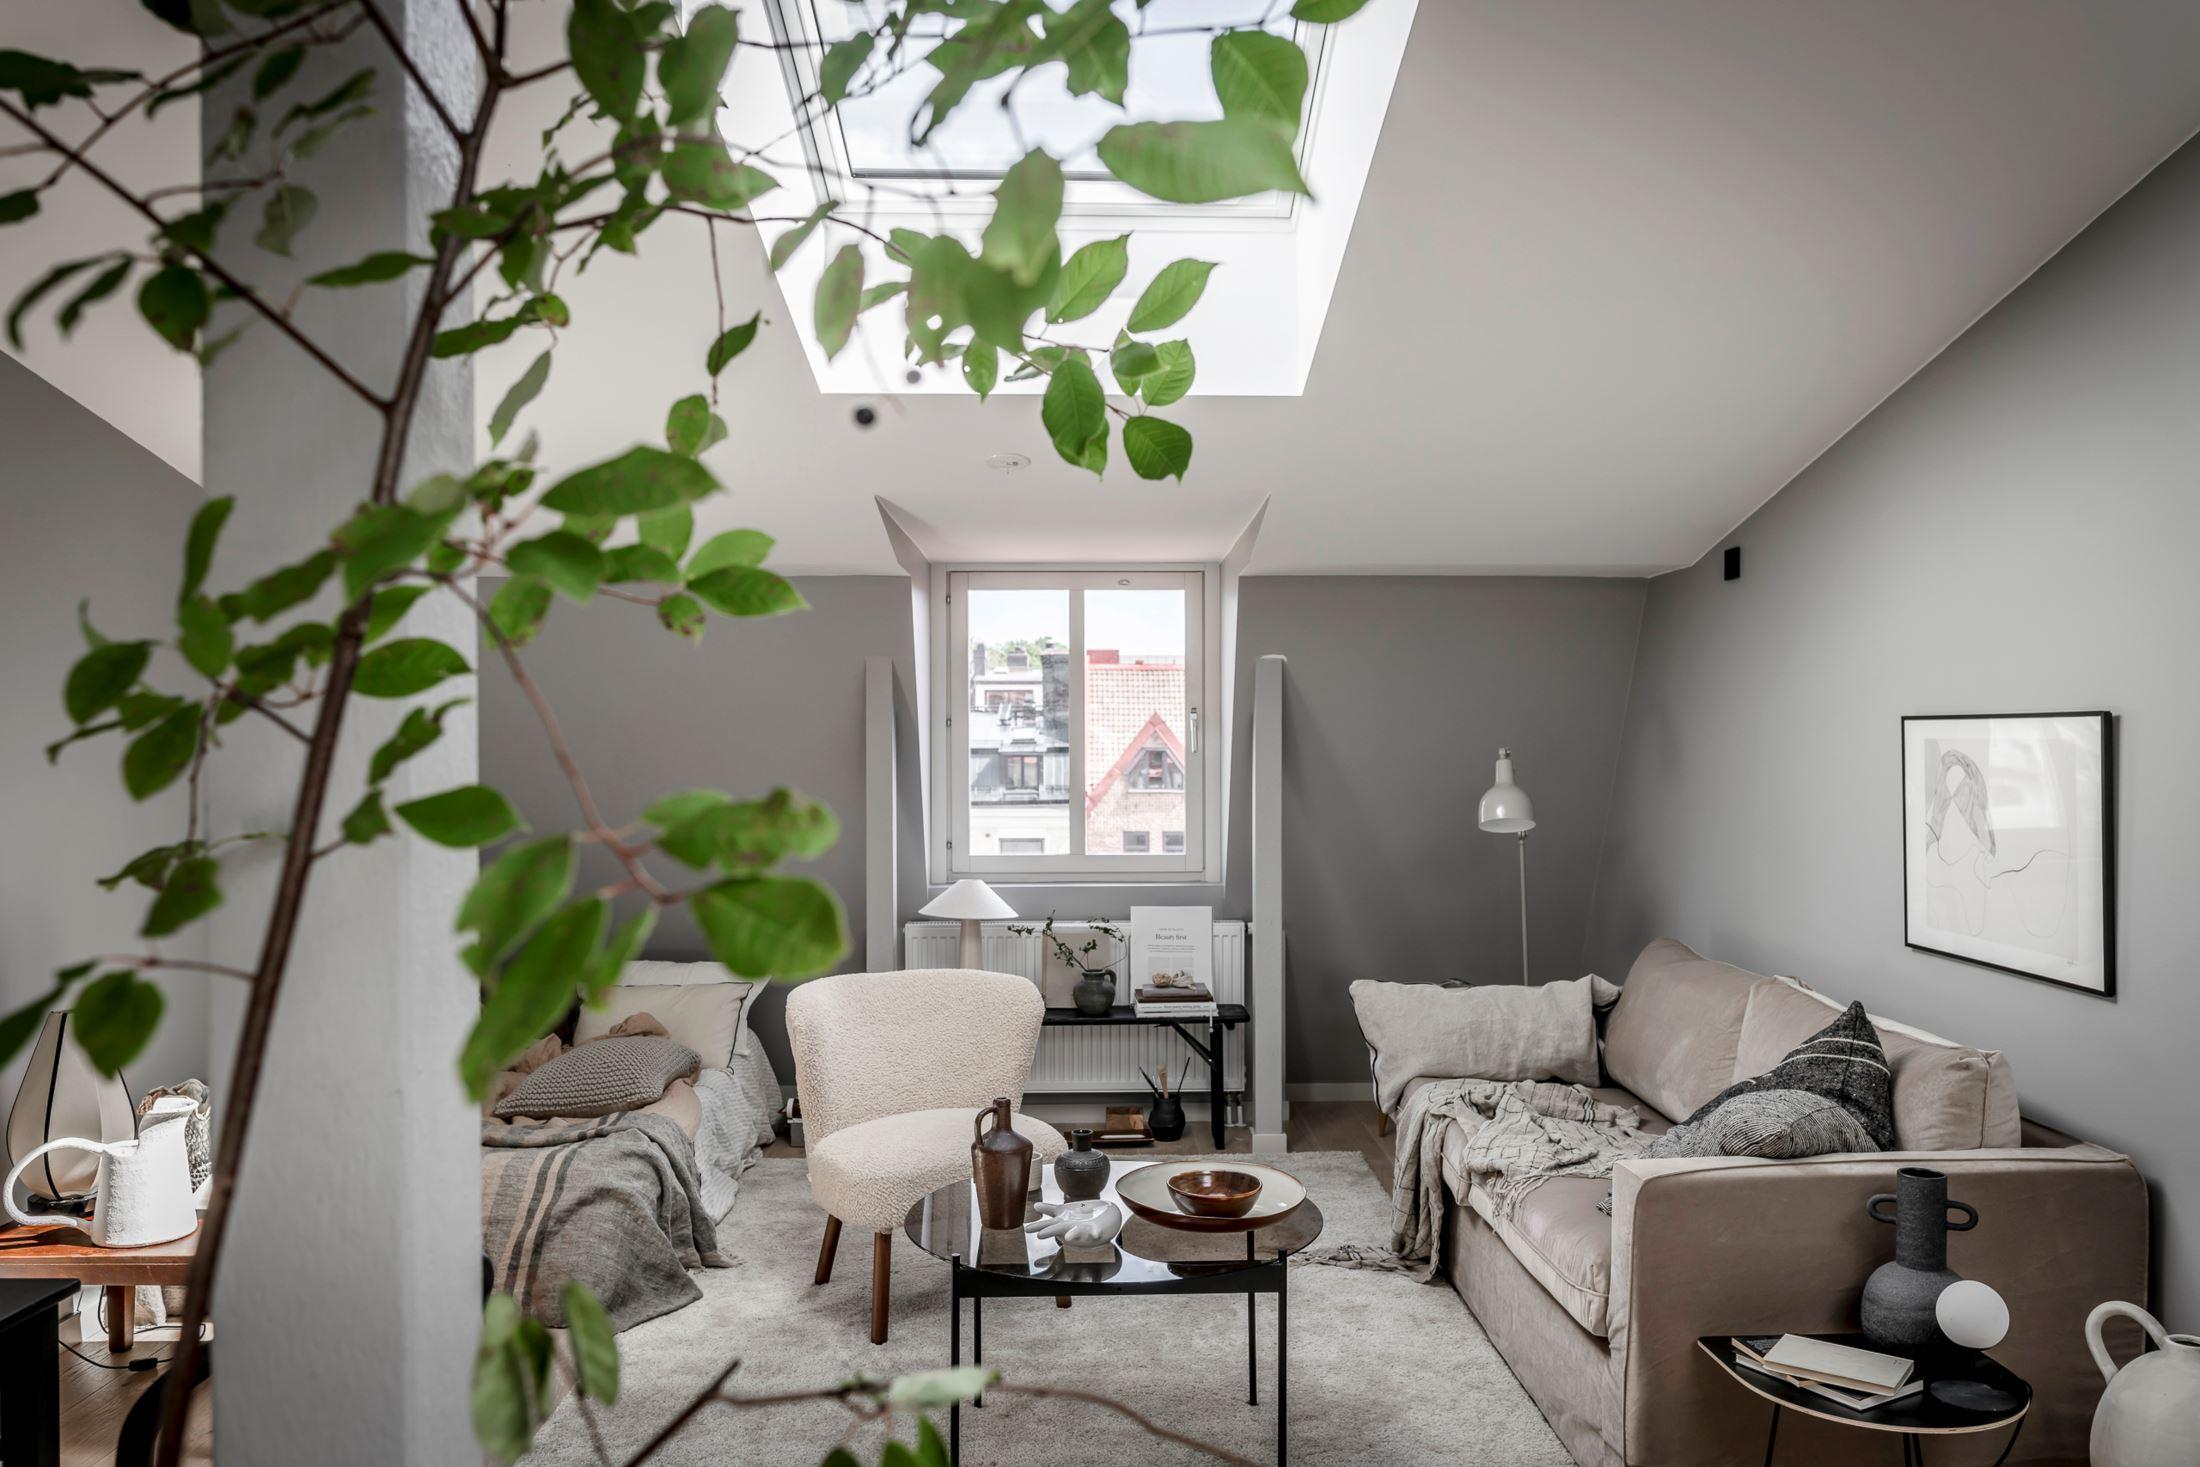 Plan deschis și decor nordic într o garsonieră la mansardă 35 m² 12